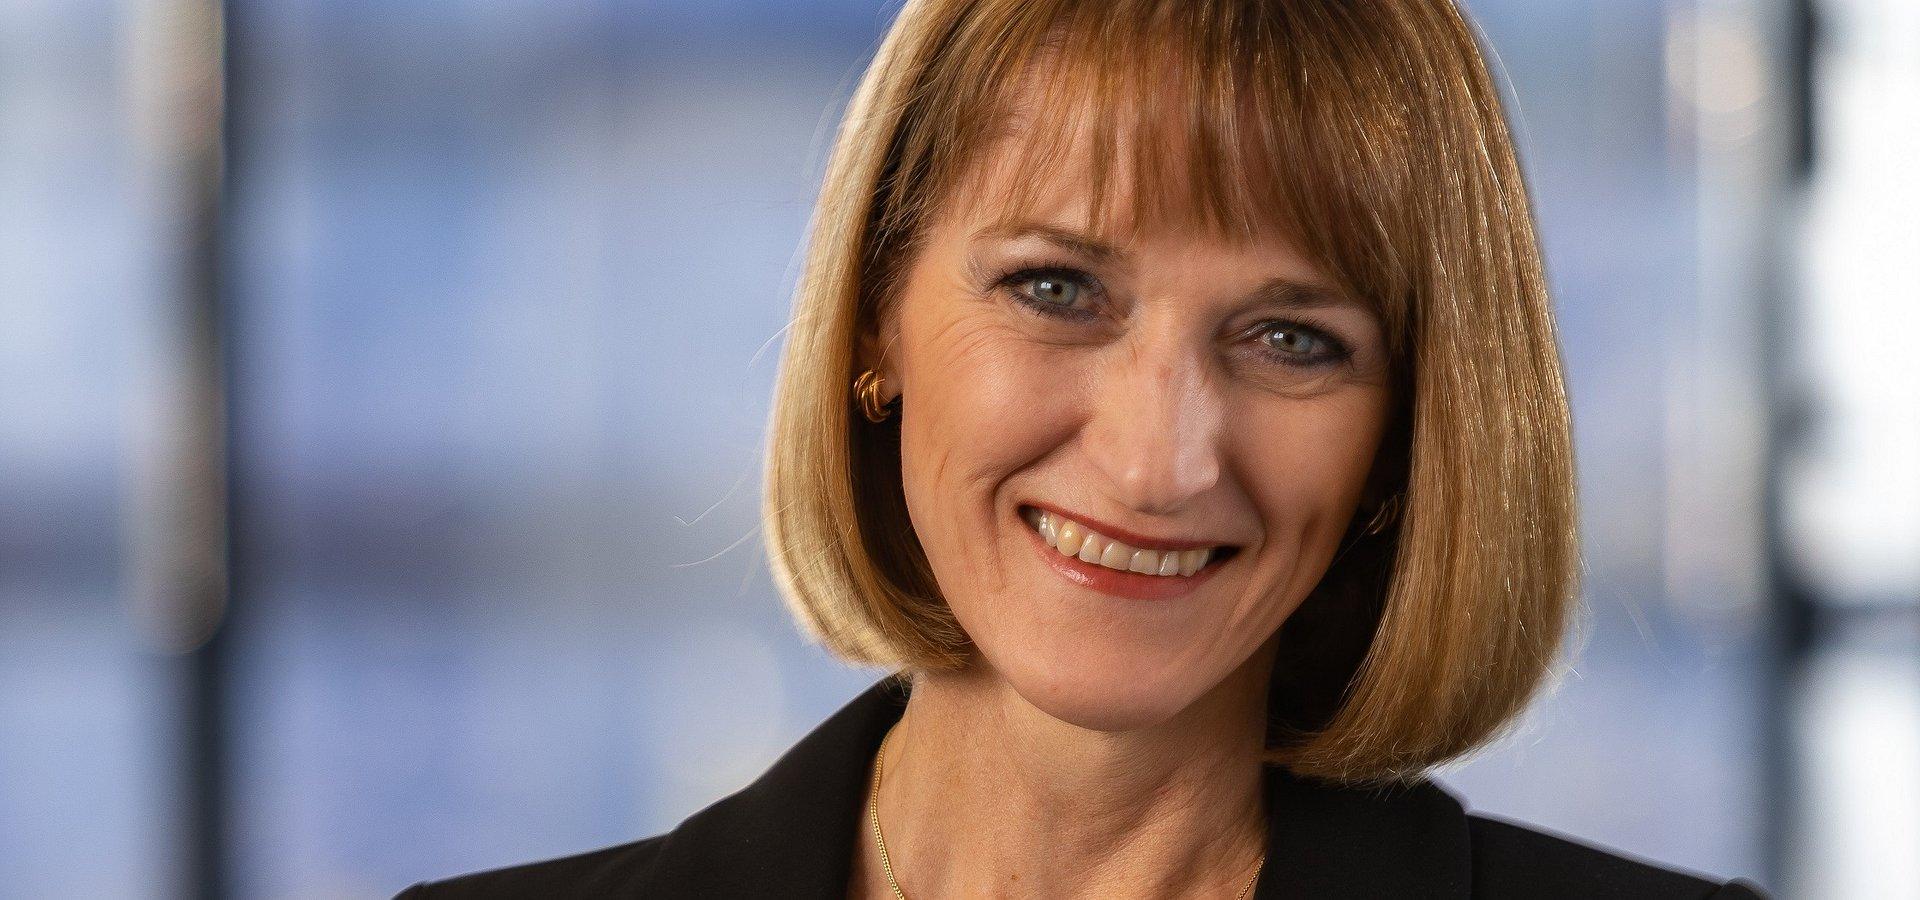 Ulana van Biljon is named the Top Woman in Property